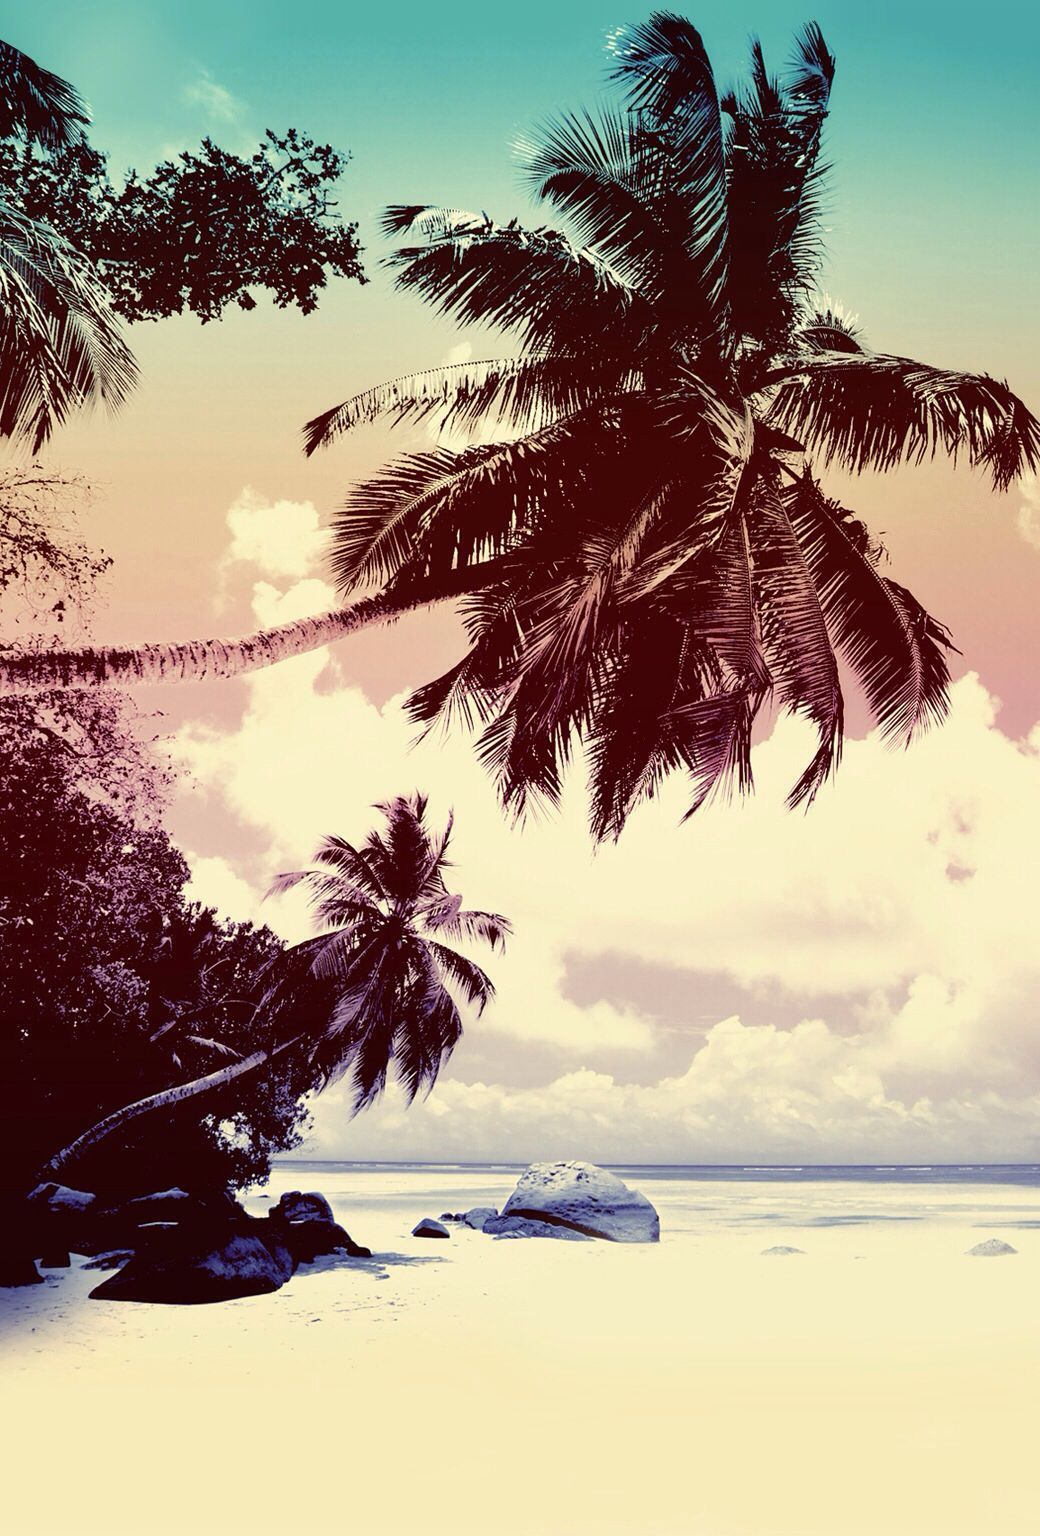 Palmen Am Strand In 2019 Palmen Am Strand Hintergrund Hintergrundbilder Desktop Hintergrund Weisser Hinte In 2020 Palm Trees Wallpaper Beach Wallpaper Tree Wallpaper